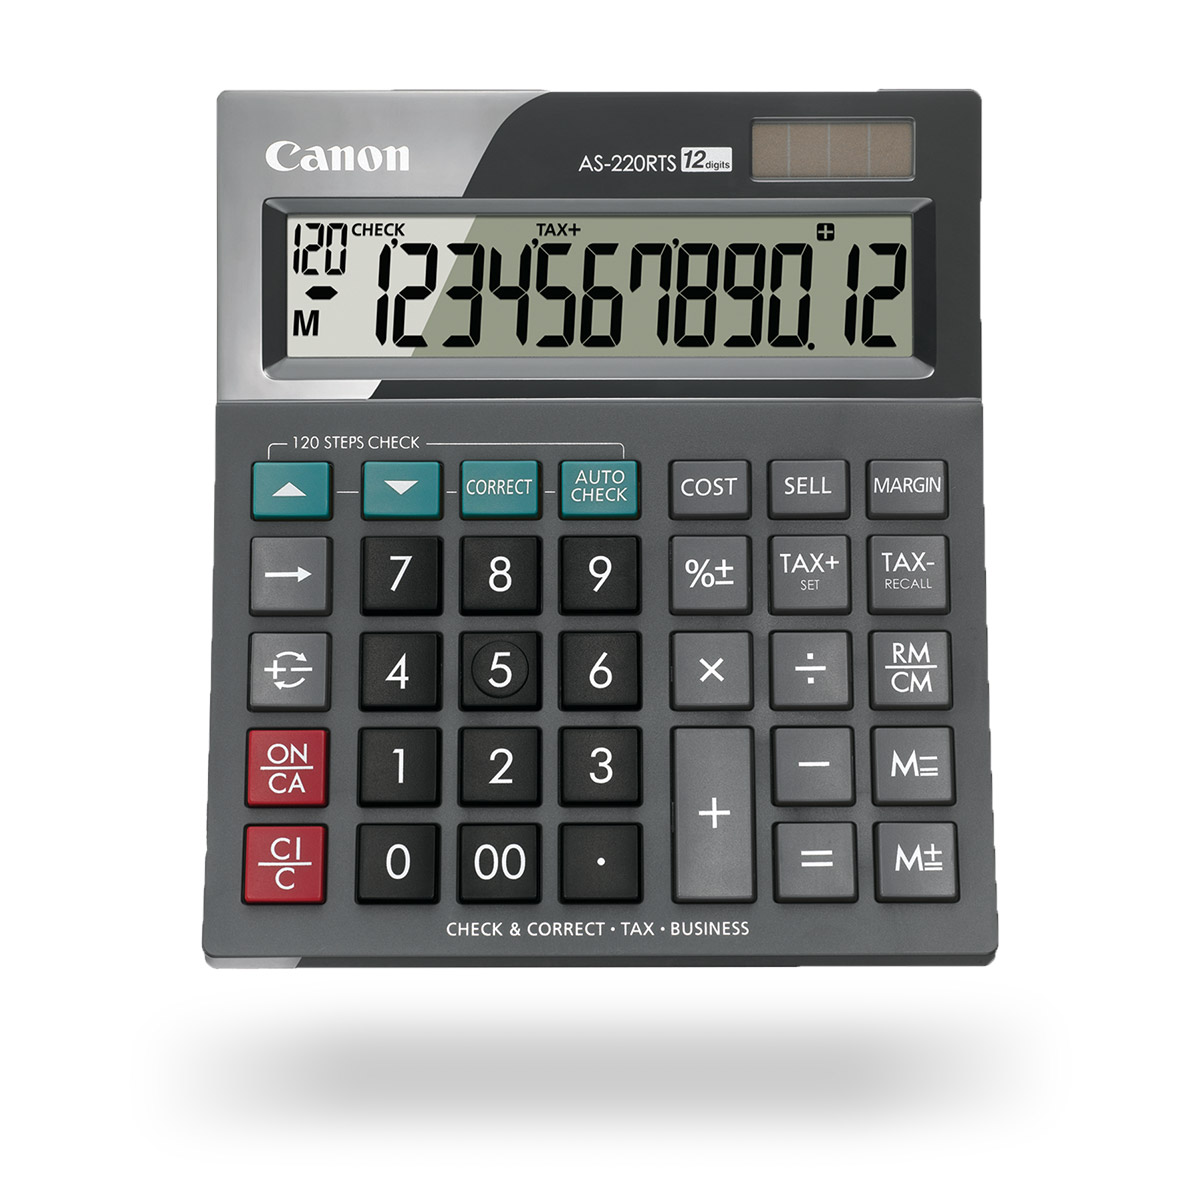 Canon AS-220RTS large desktop calculator